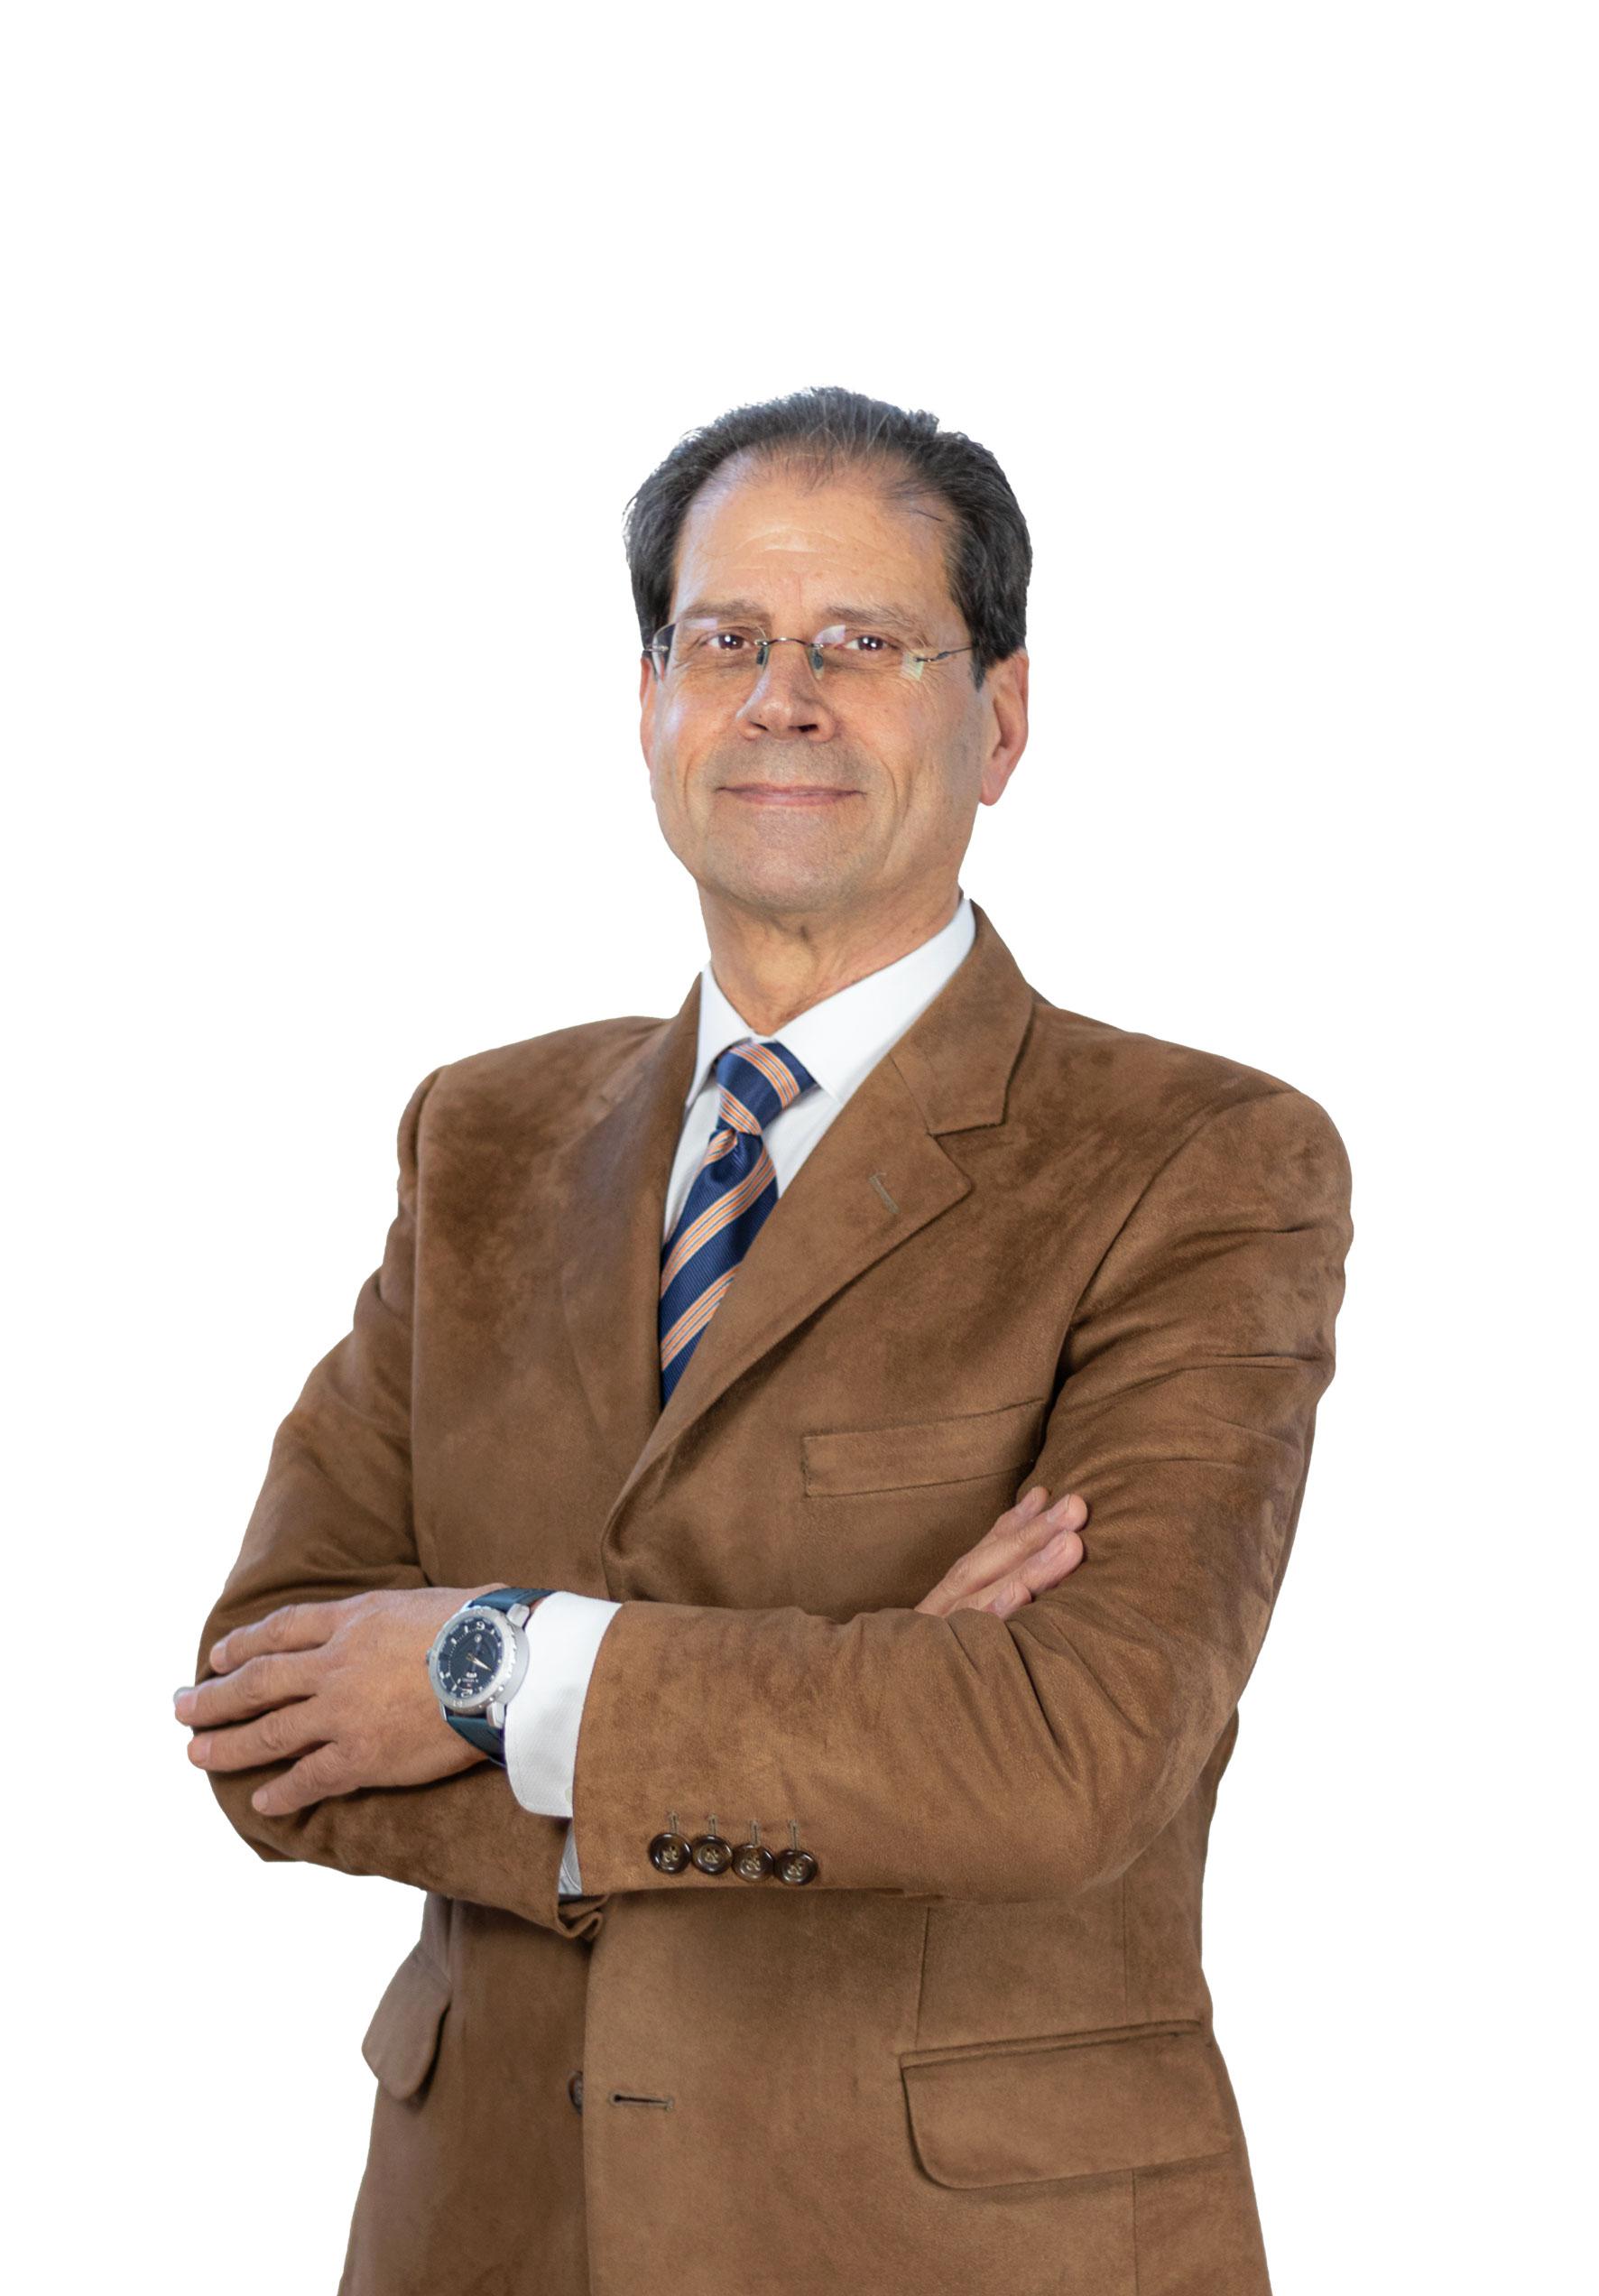 Óscar Olhero